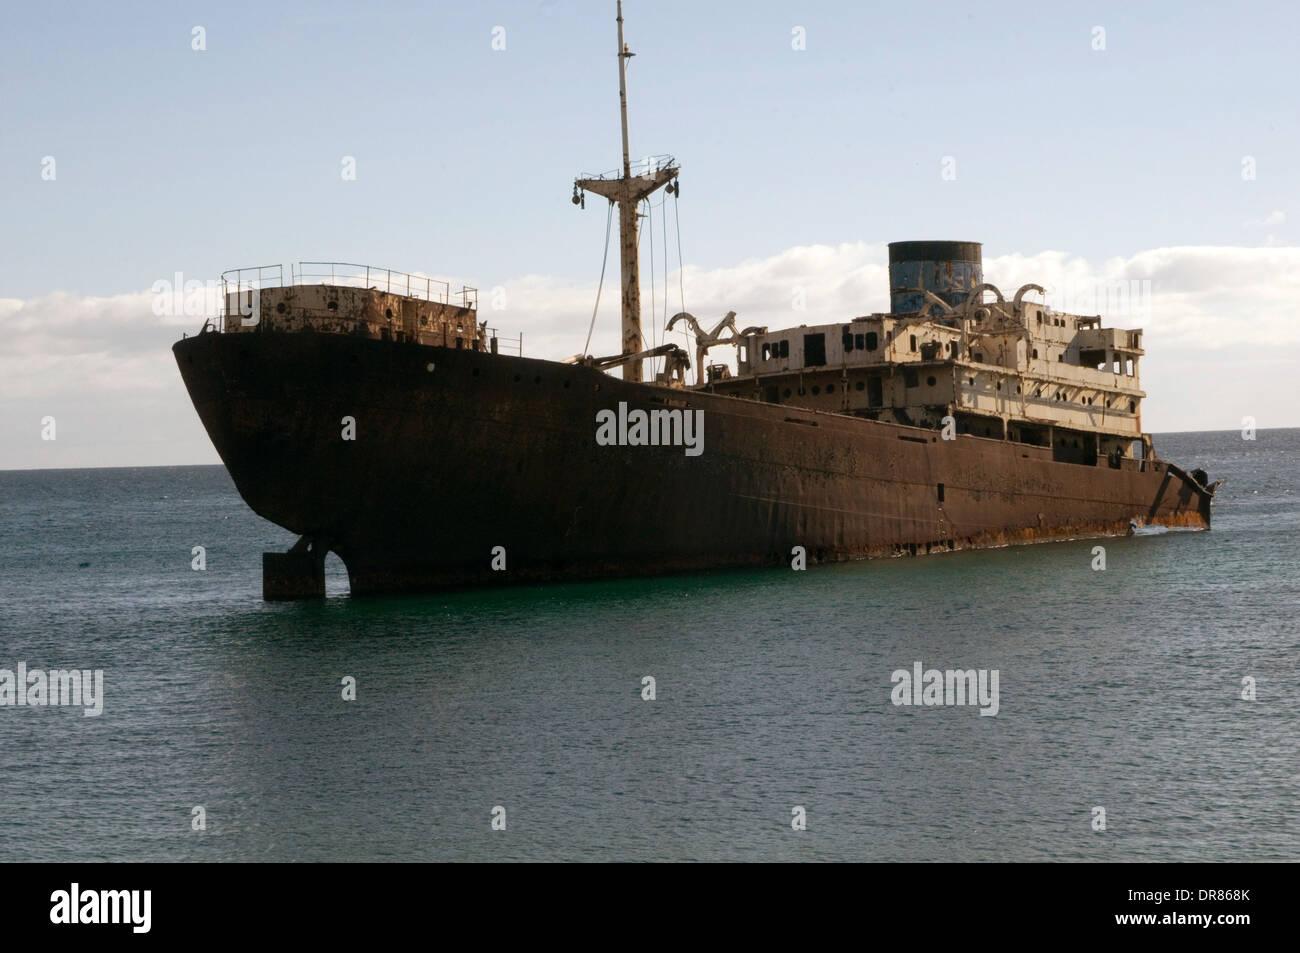 Lanzarote Shipwreck between Arrecife and Costa Teguise Temple Hall Pantelis Telamon ship ships shipping wreck wrecks sunk sinkin - Stock Image